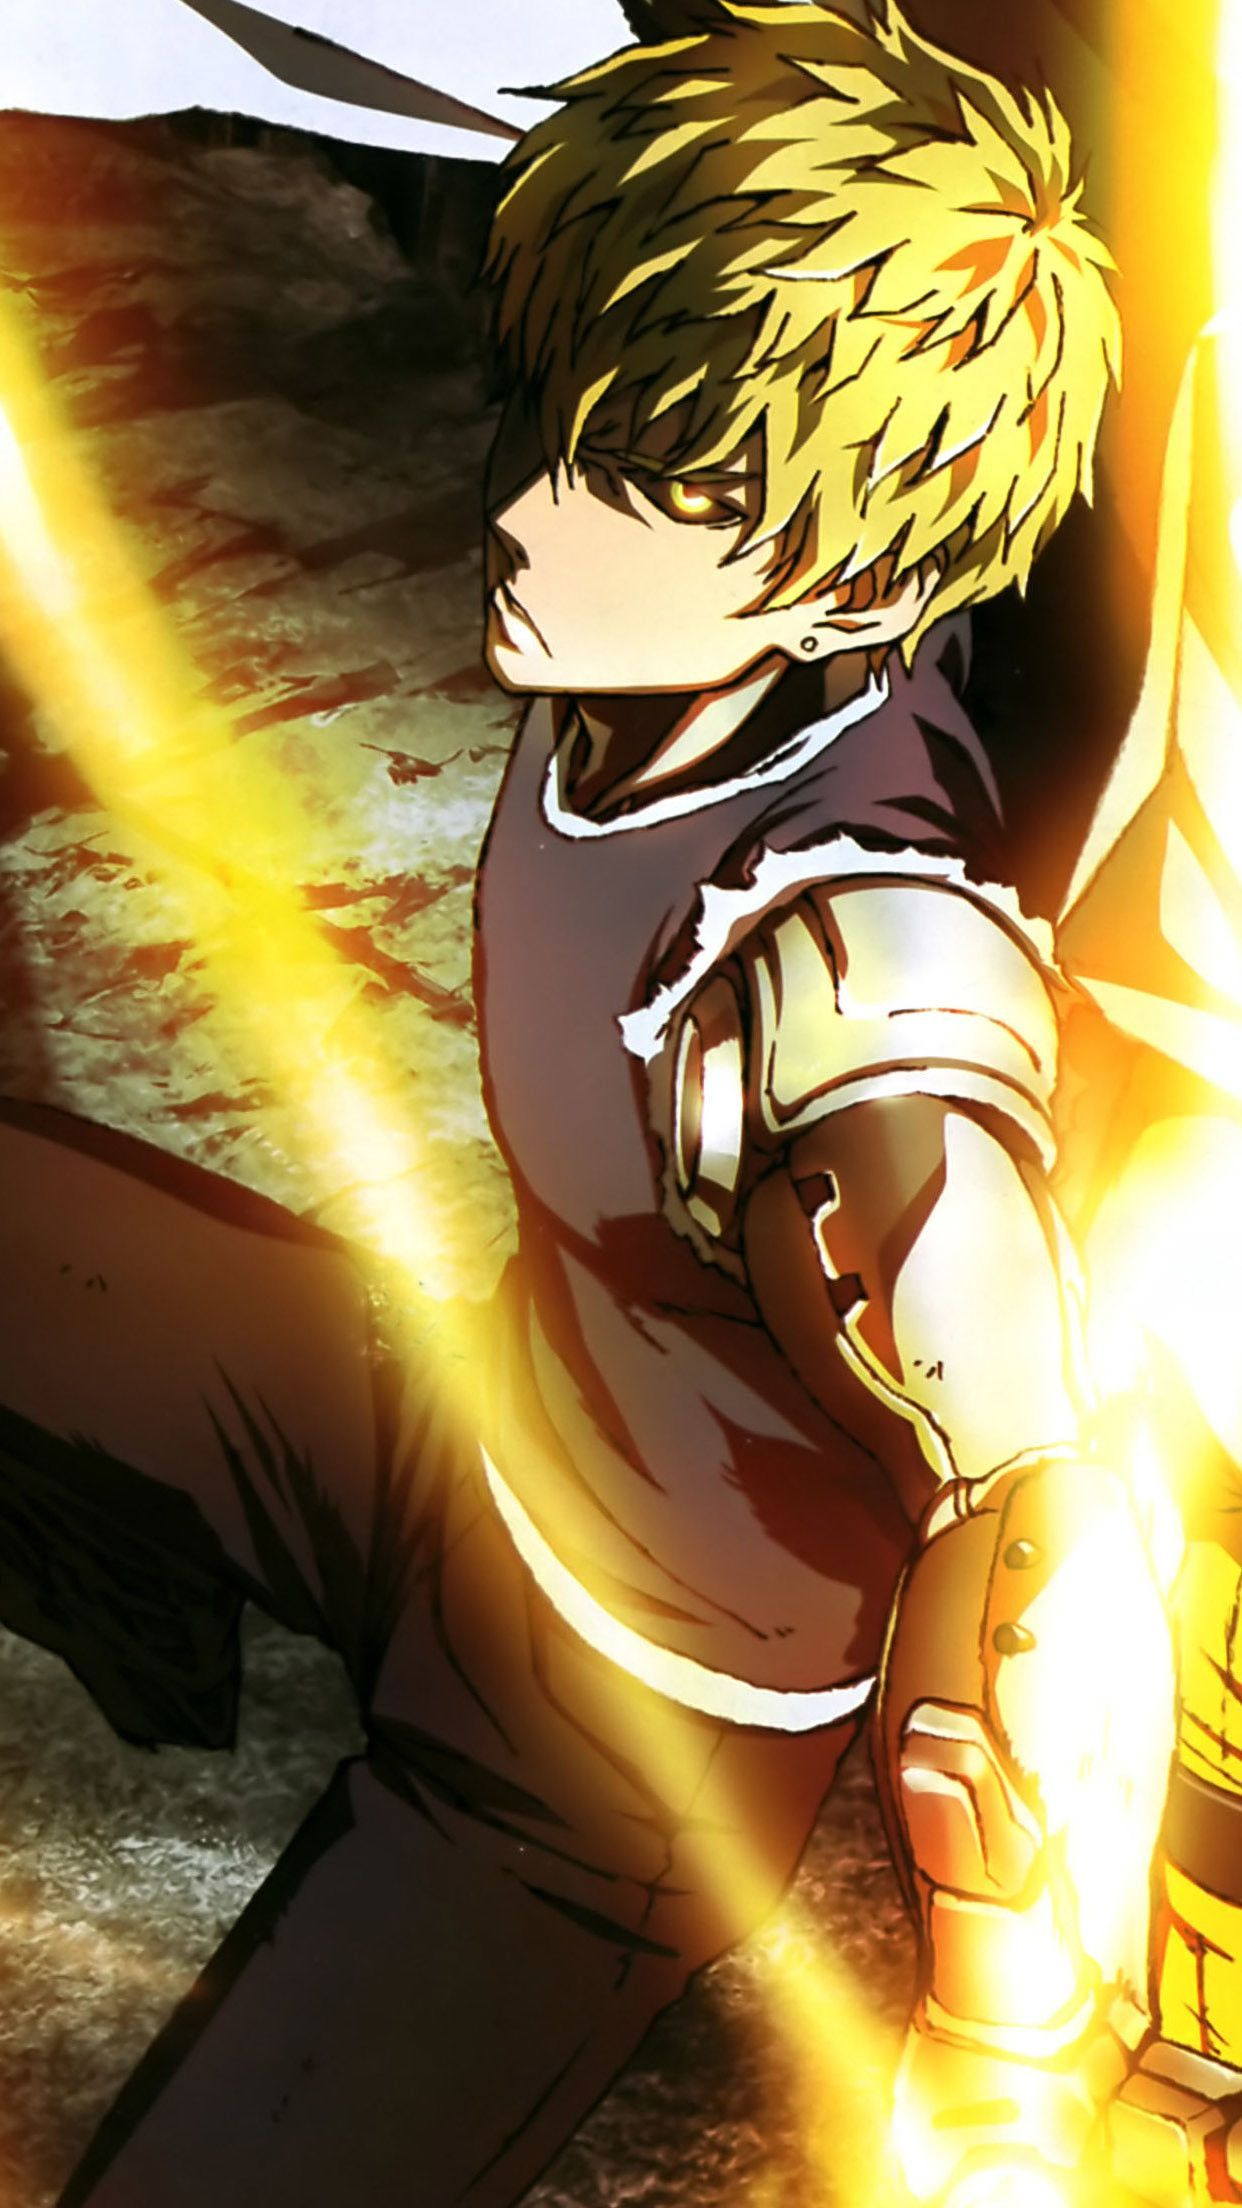 Pin By Jovis Fonseka On Anime One Punch Man Anime One Punch Man Manga One Punch Man